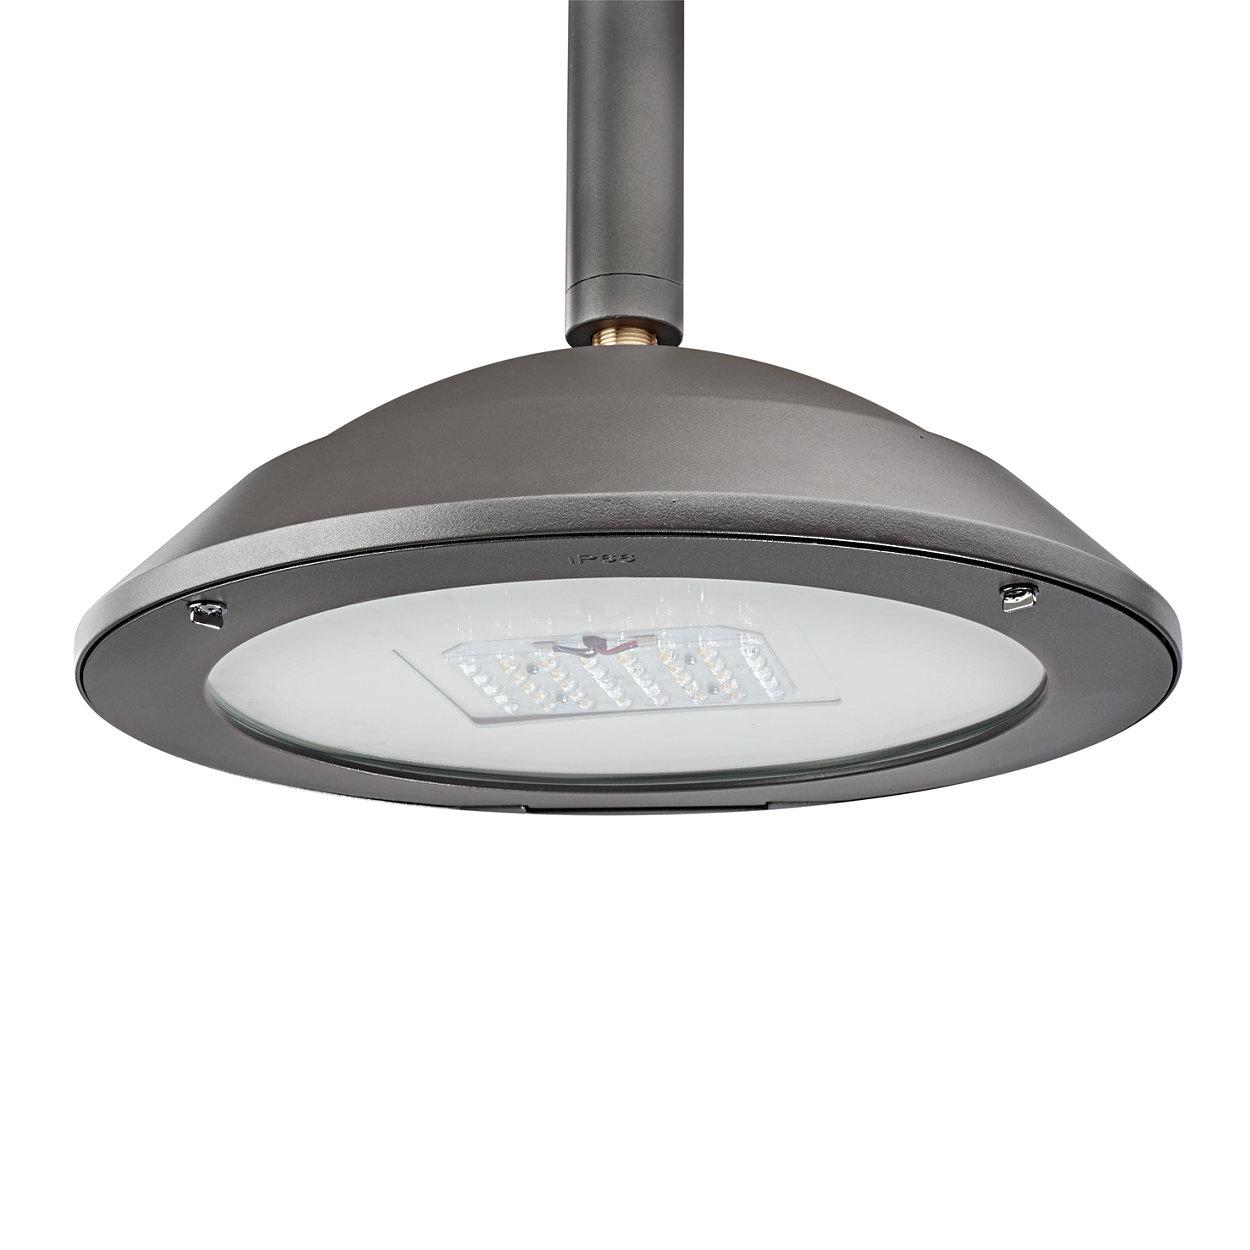 Design minimalista para uma luminária versátil